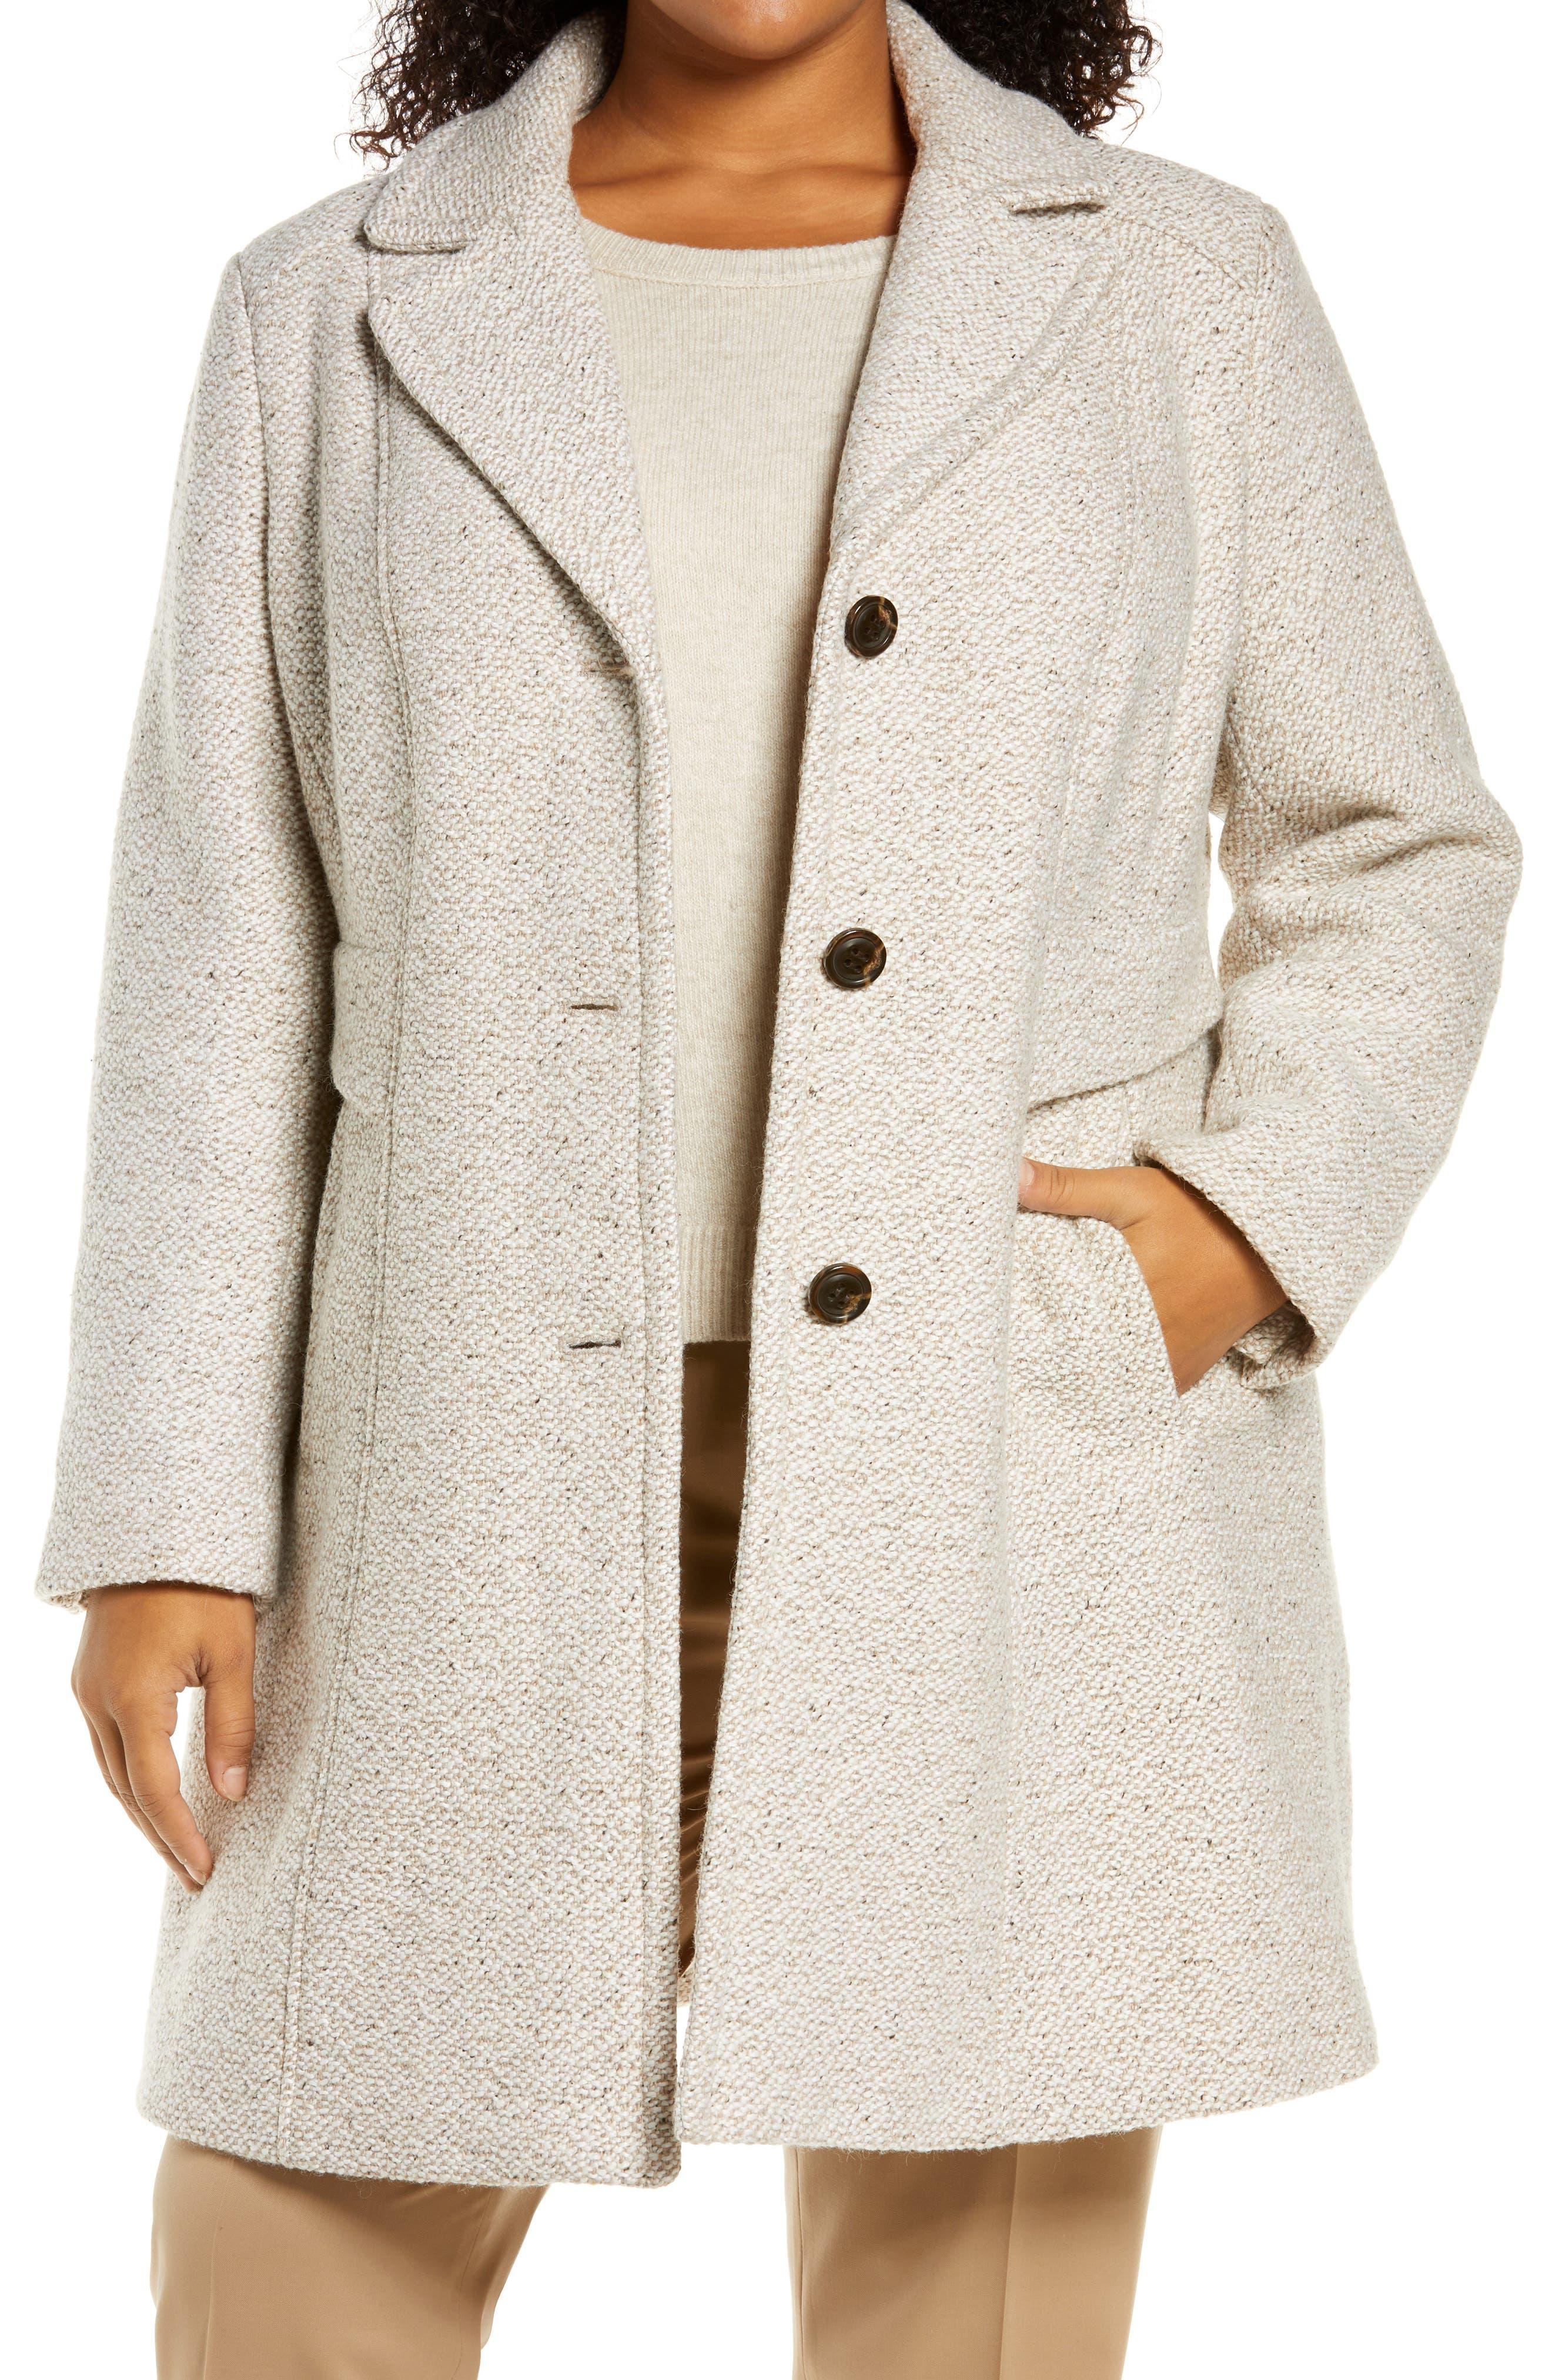 Notch Collar Tweed Coat